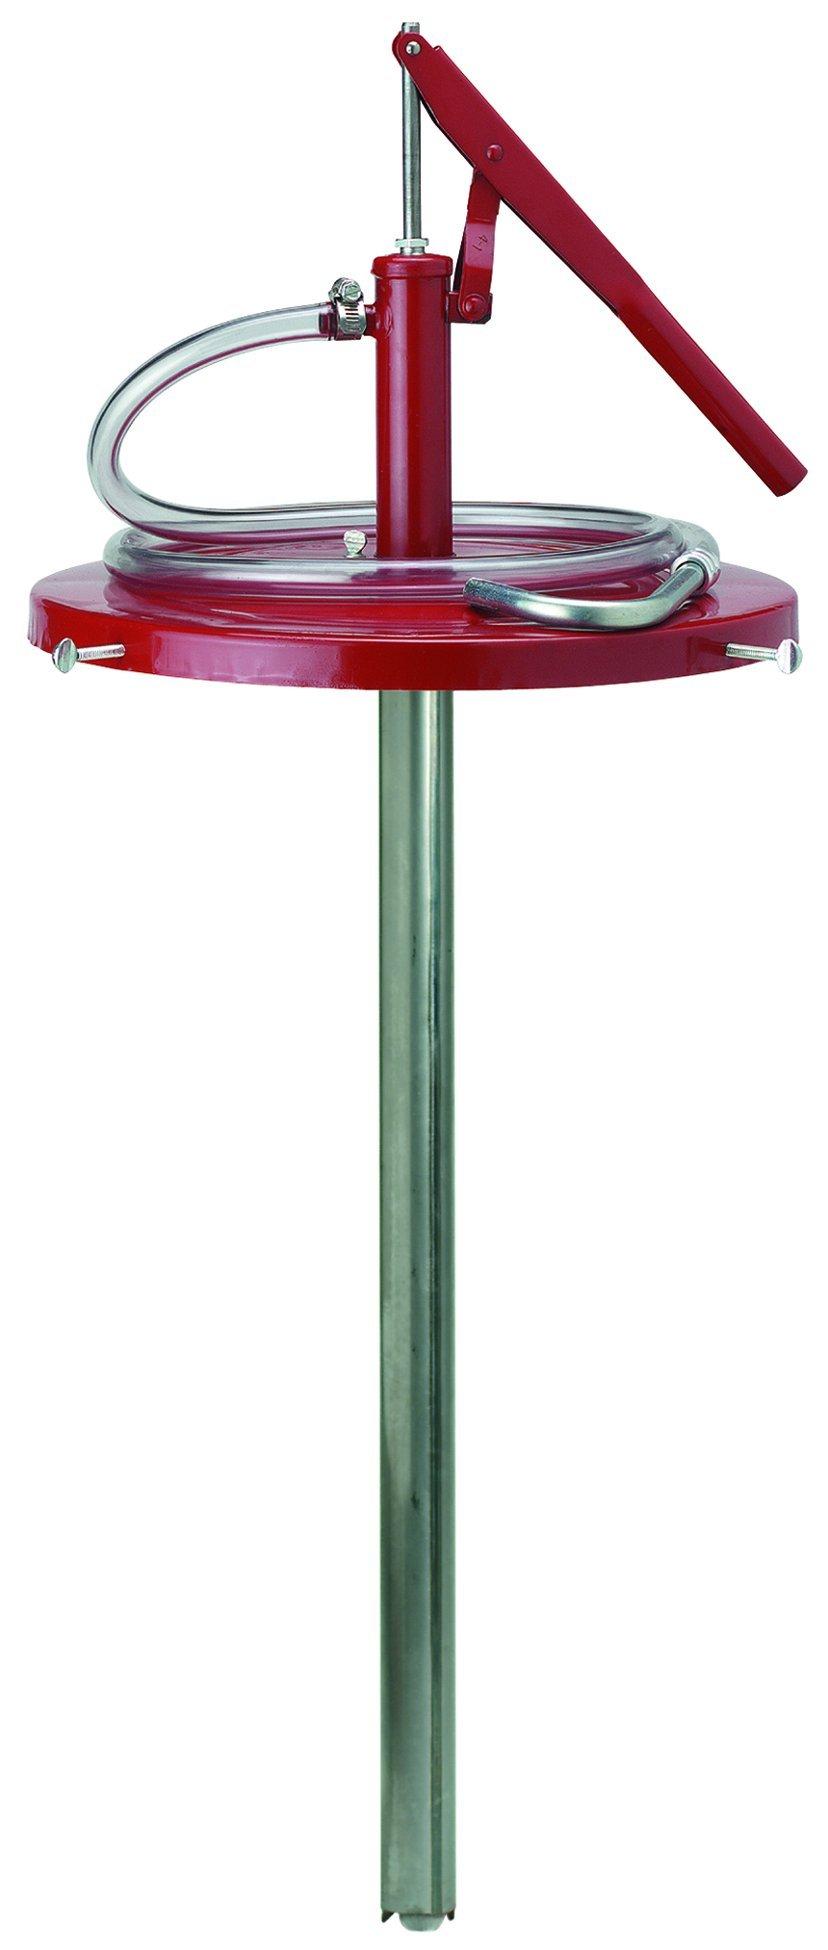 Plews 55-441 Lever Action Dispenser by Plews / Edelmann (Image #1)